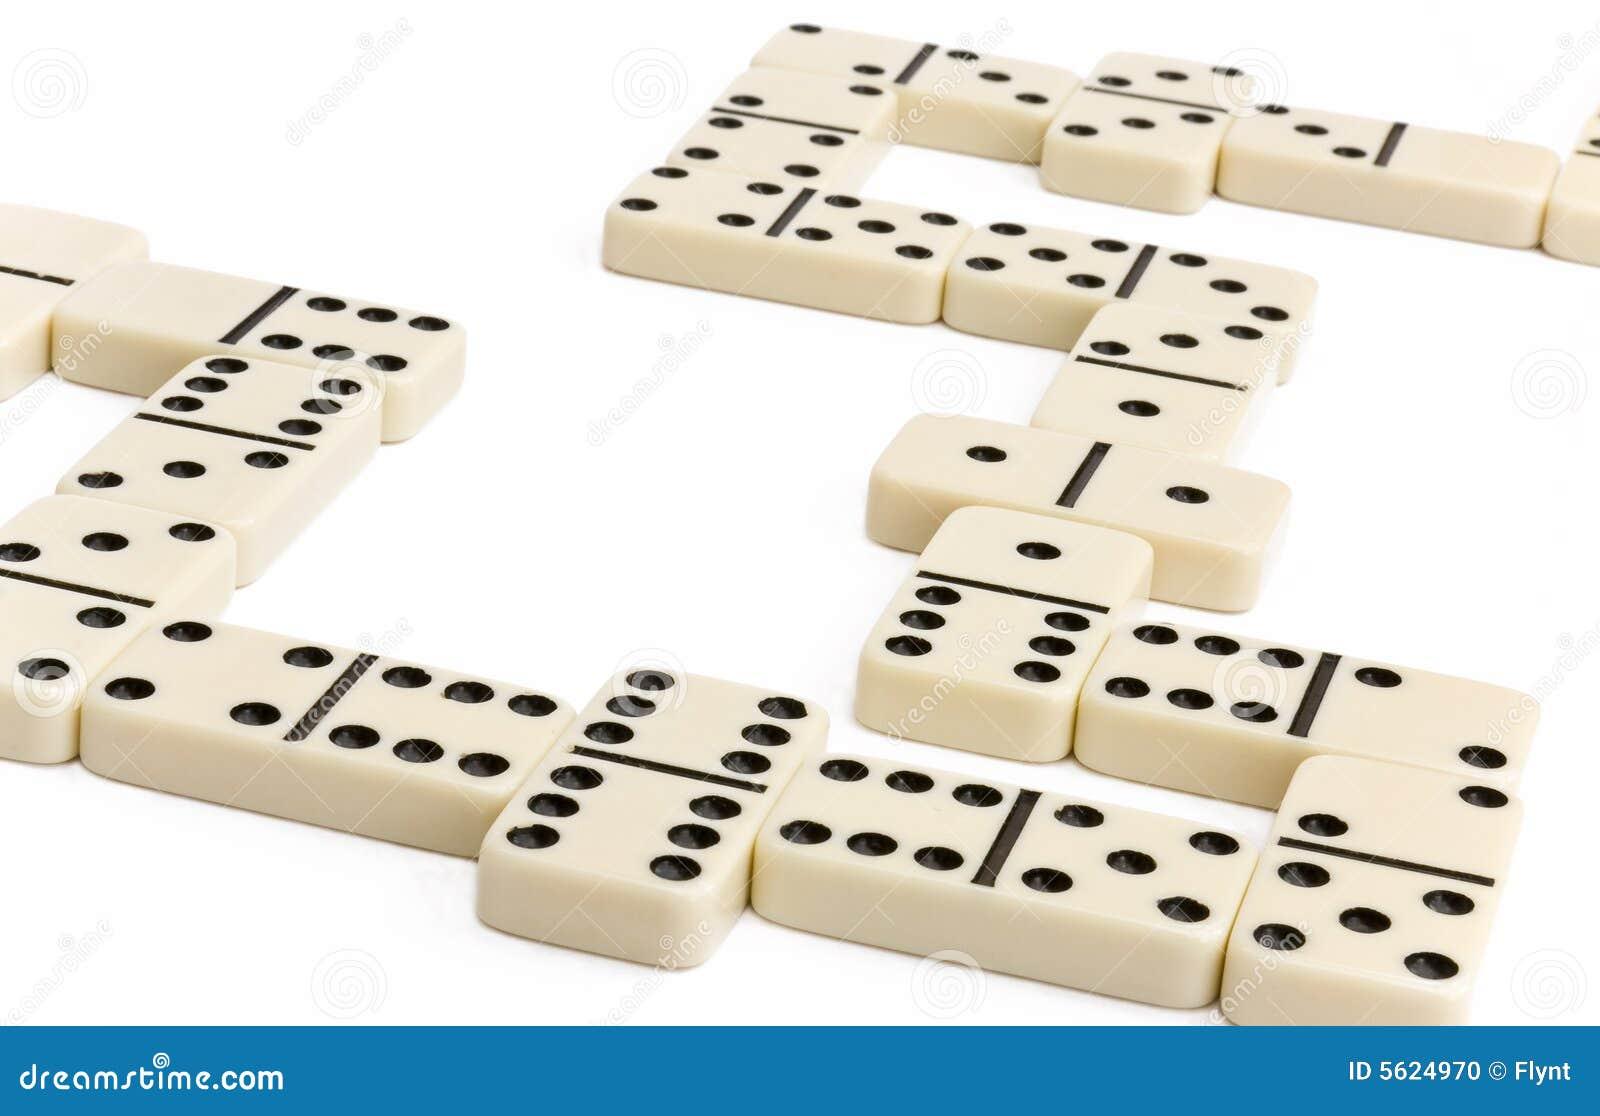 Jeu blanc de domino